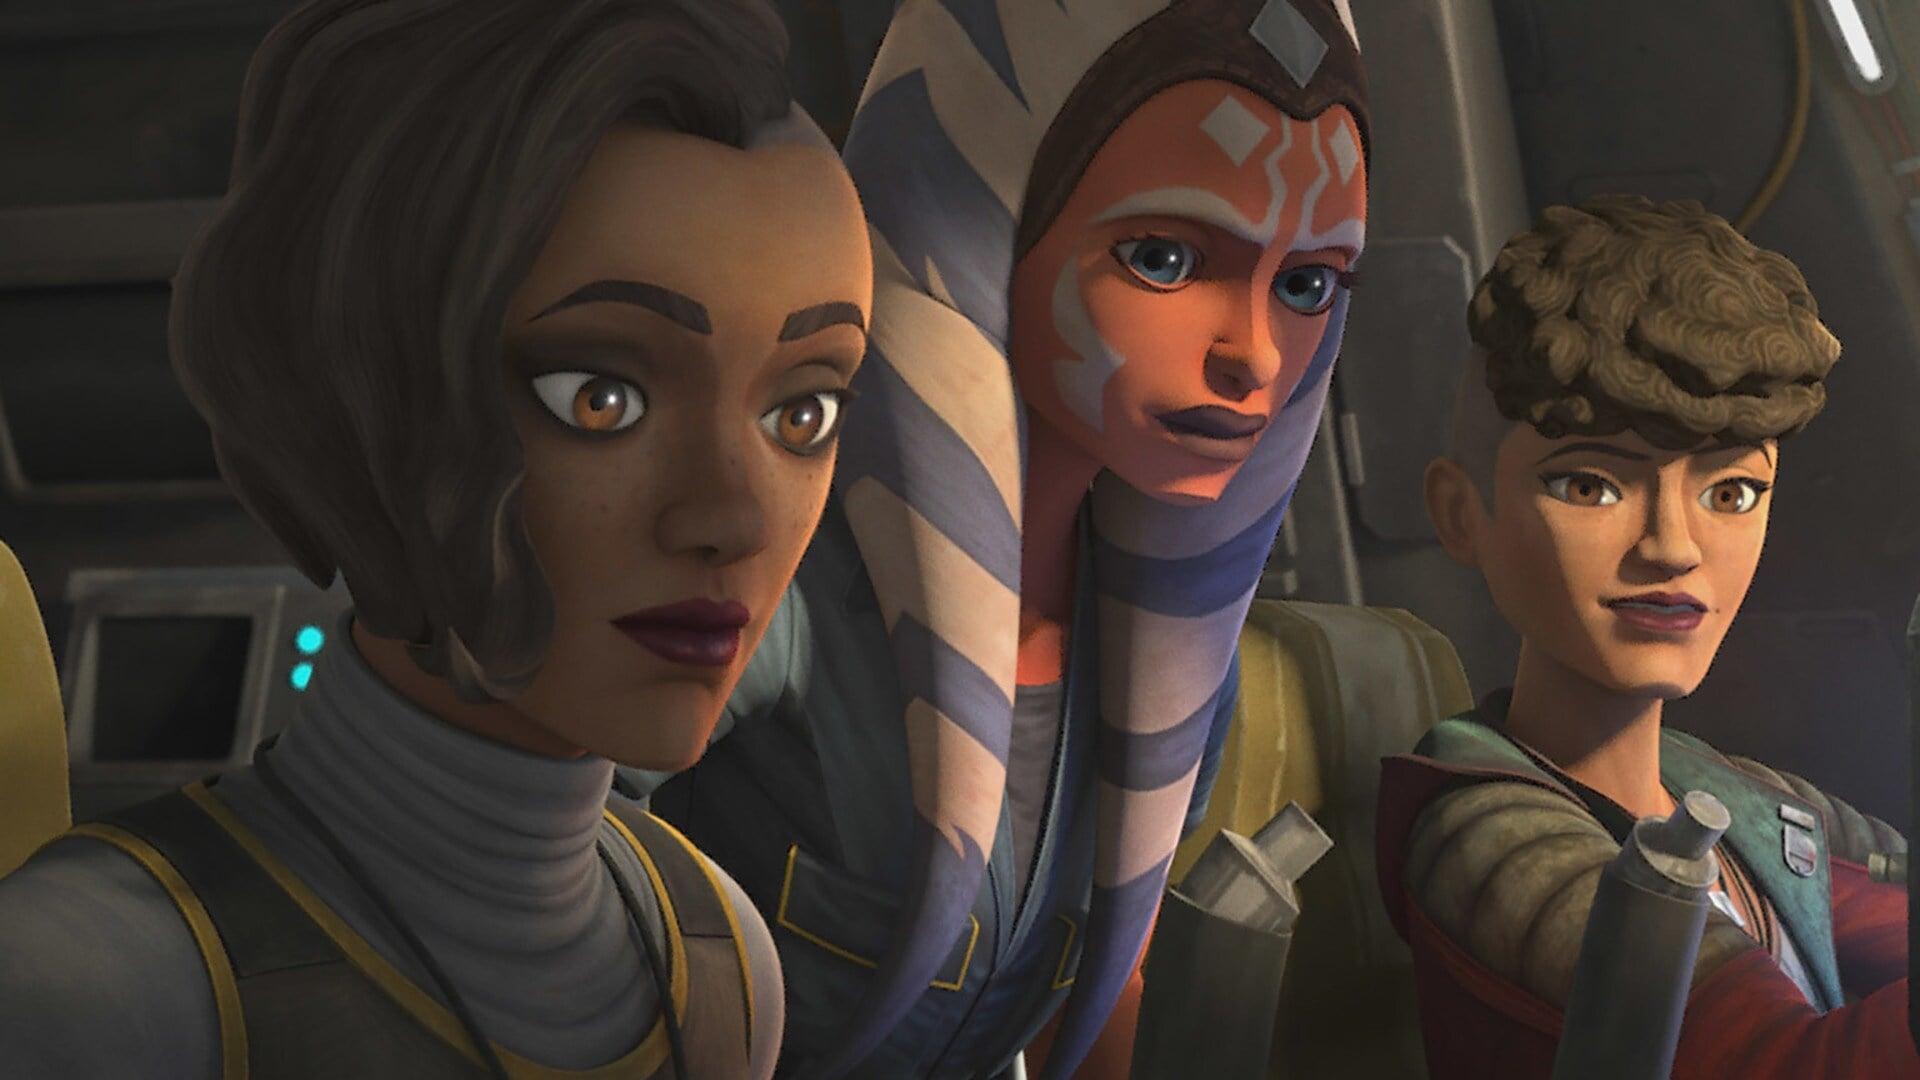 Star Wars: The Clone Wars - Season 7 Episode 6 : Deal No Deal